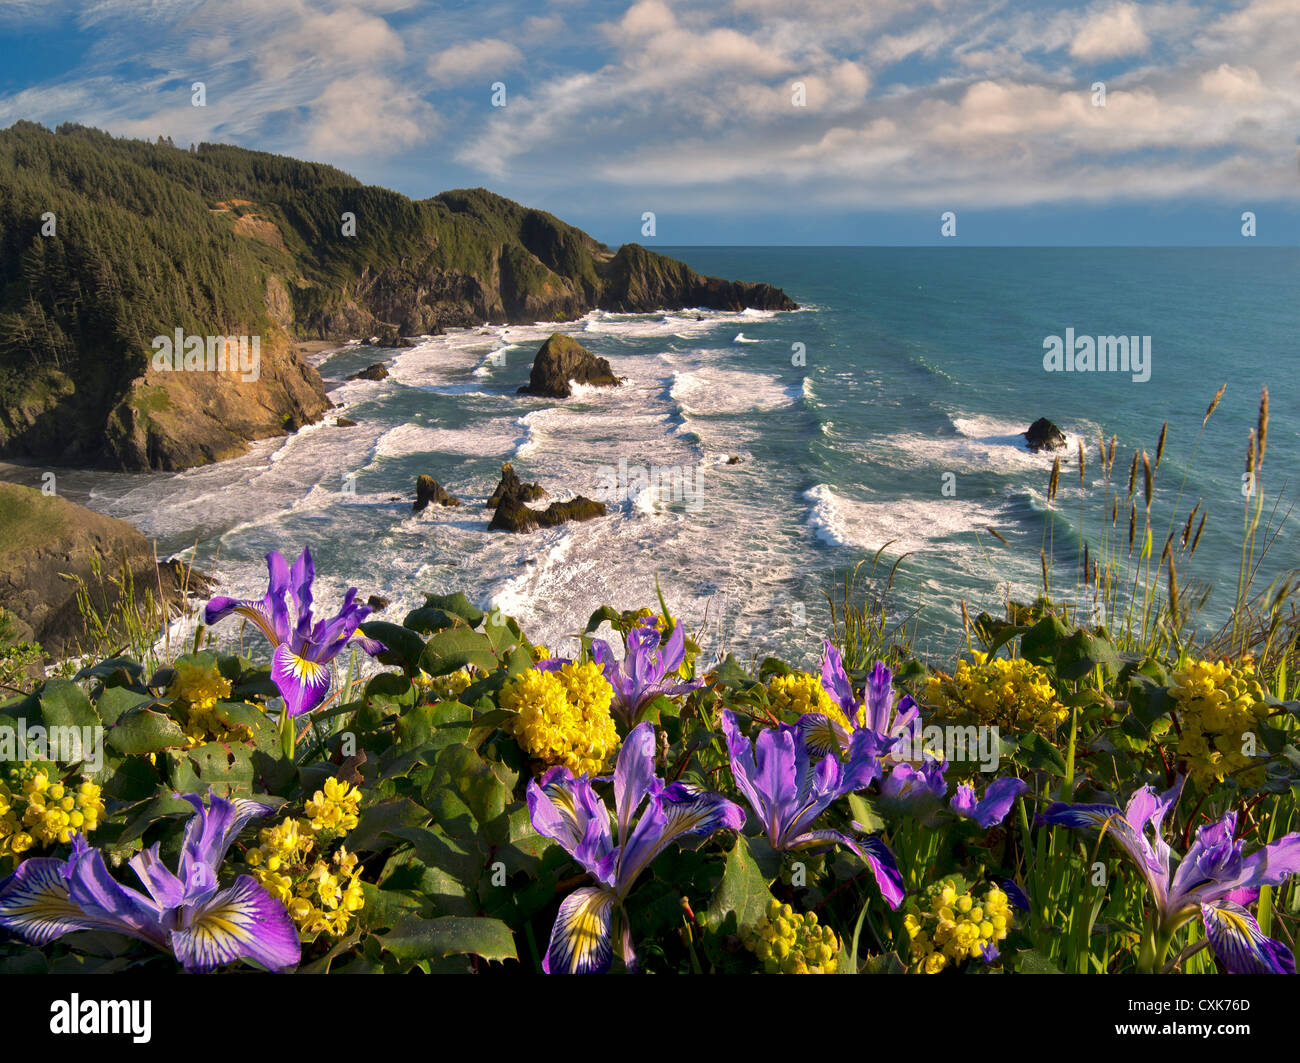 Wild Iris and Oregon Grape growing on cliff overlooking Samuel H. Boardman State Scenic Corridor. Oregon Stock Photo